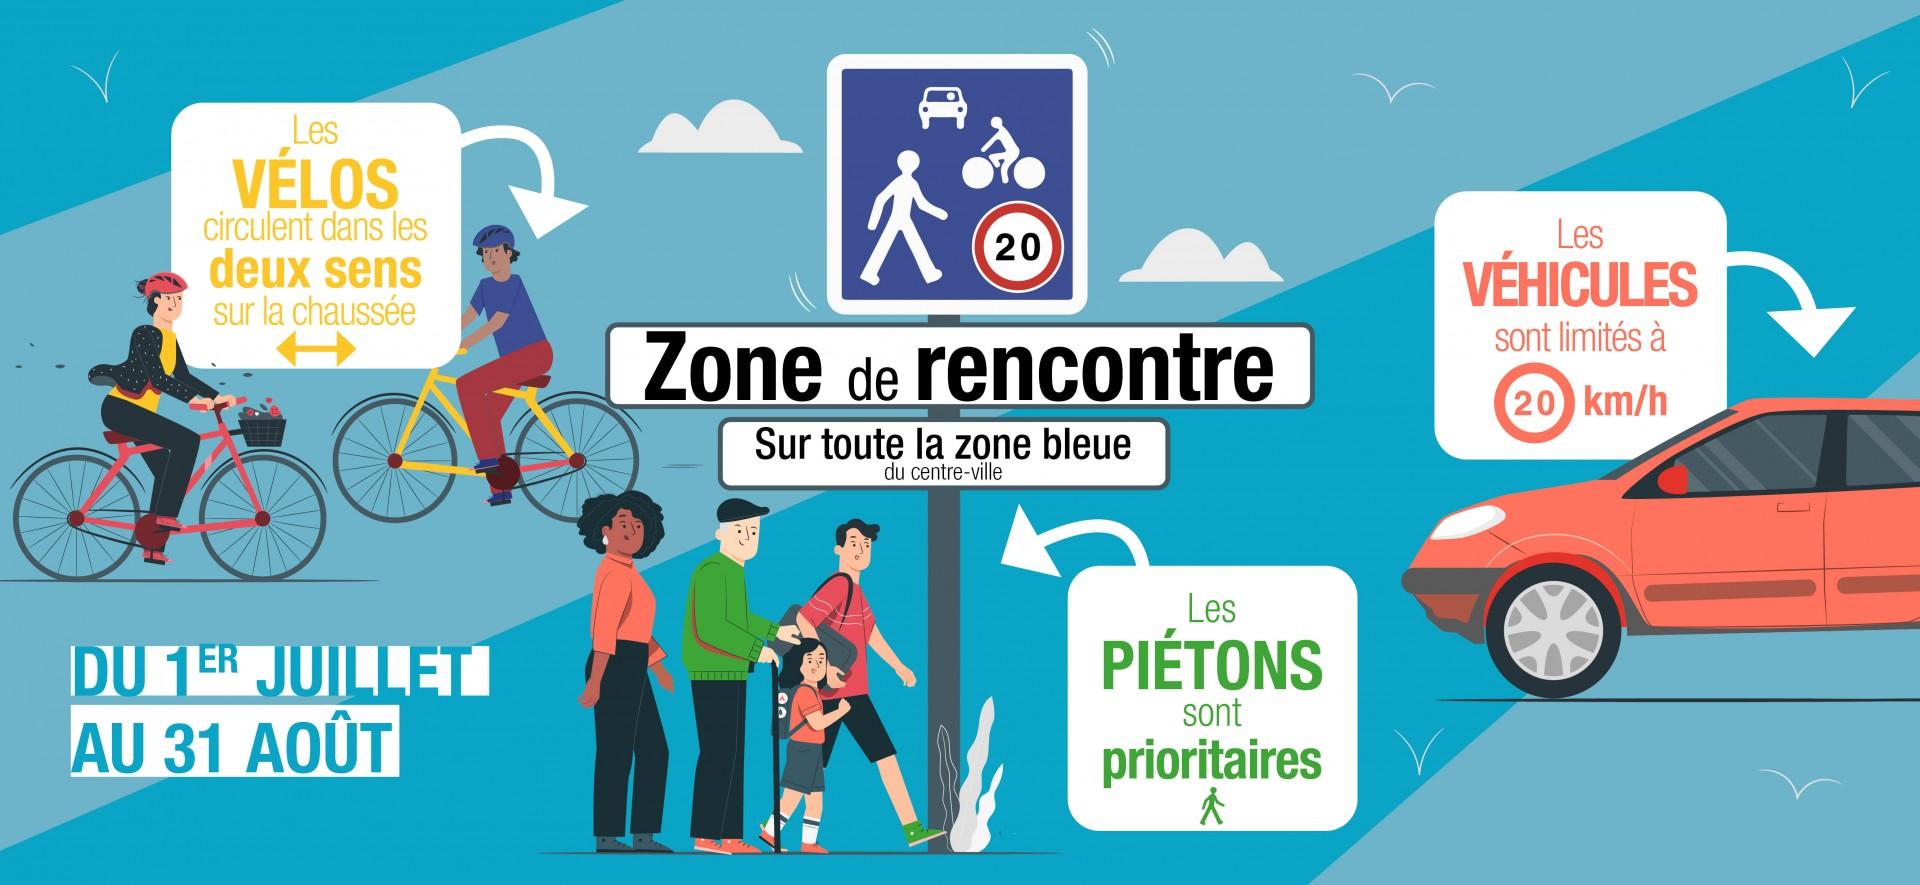 siteactu-zonerencontre-9316